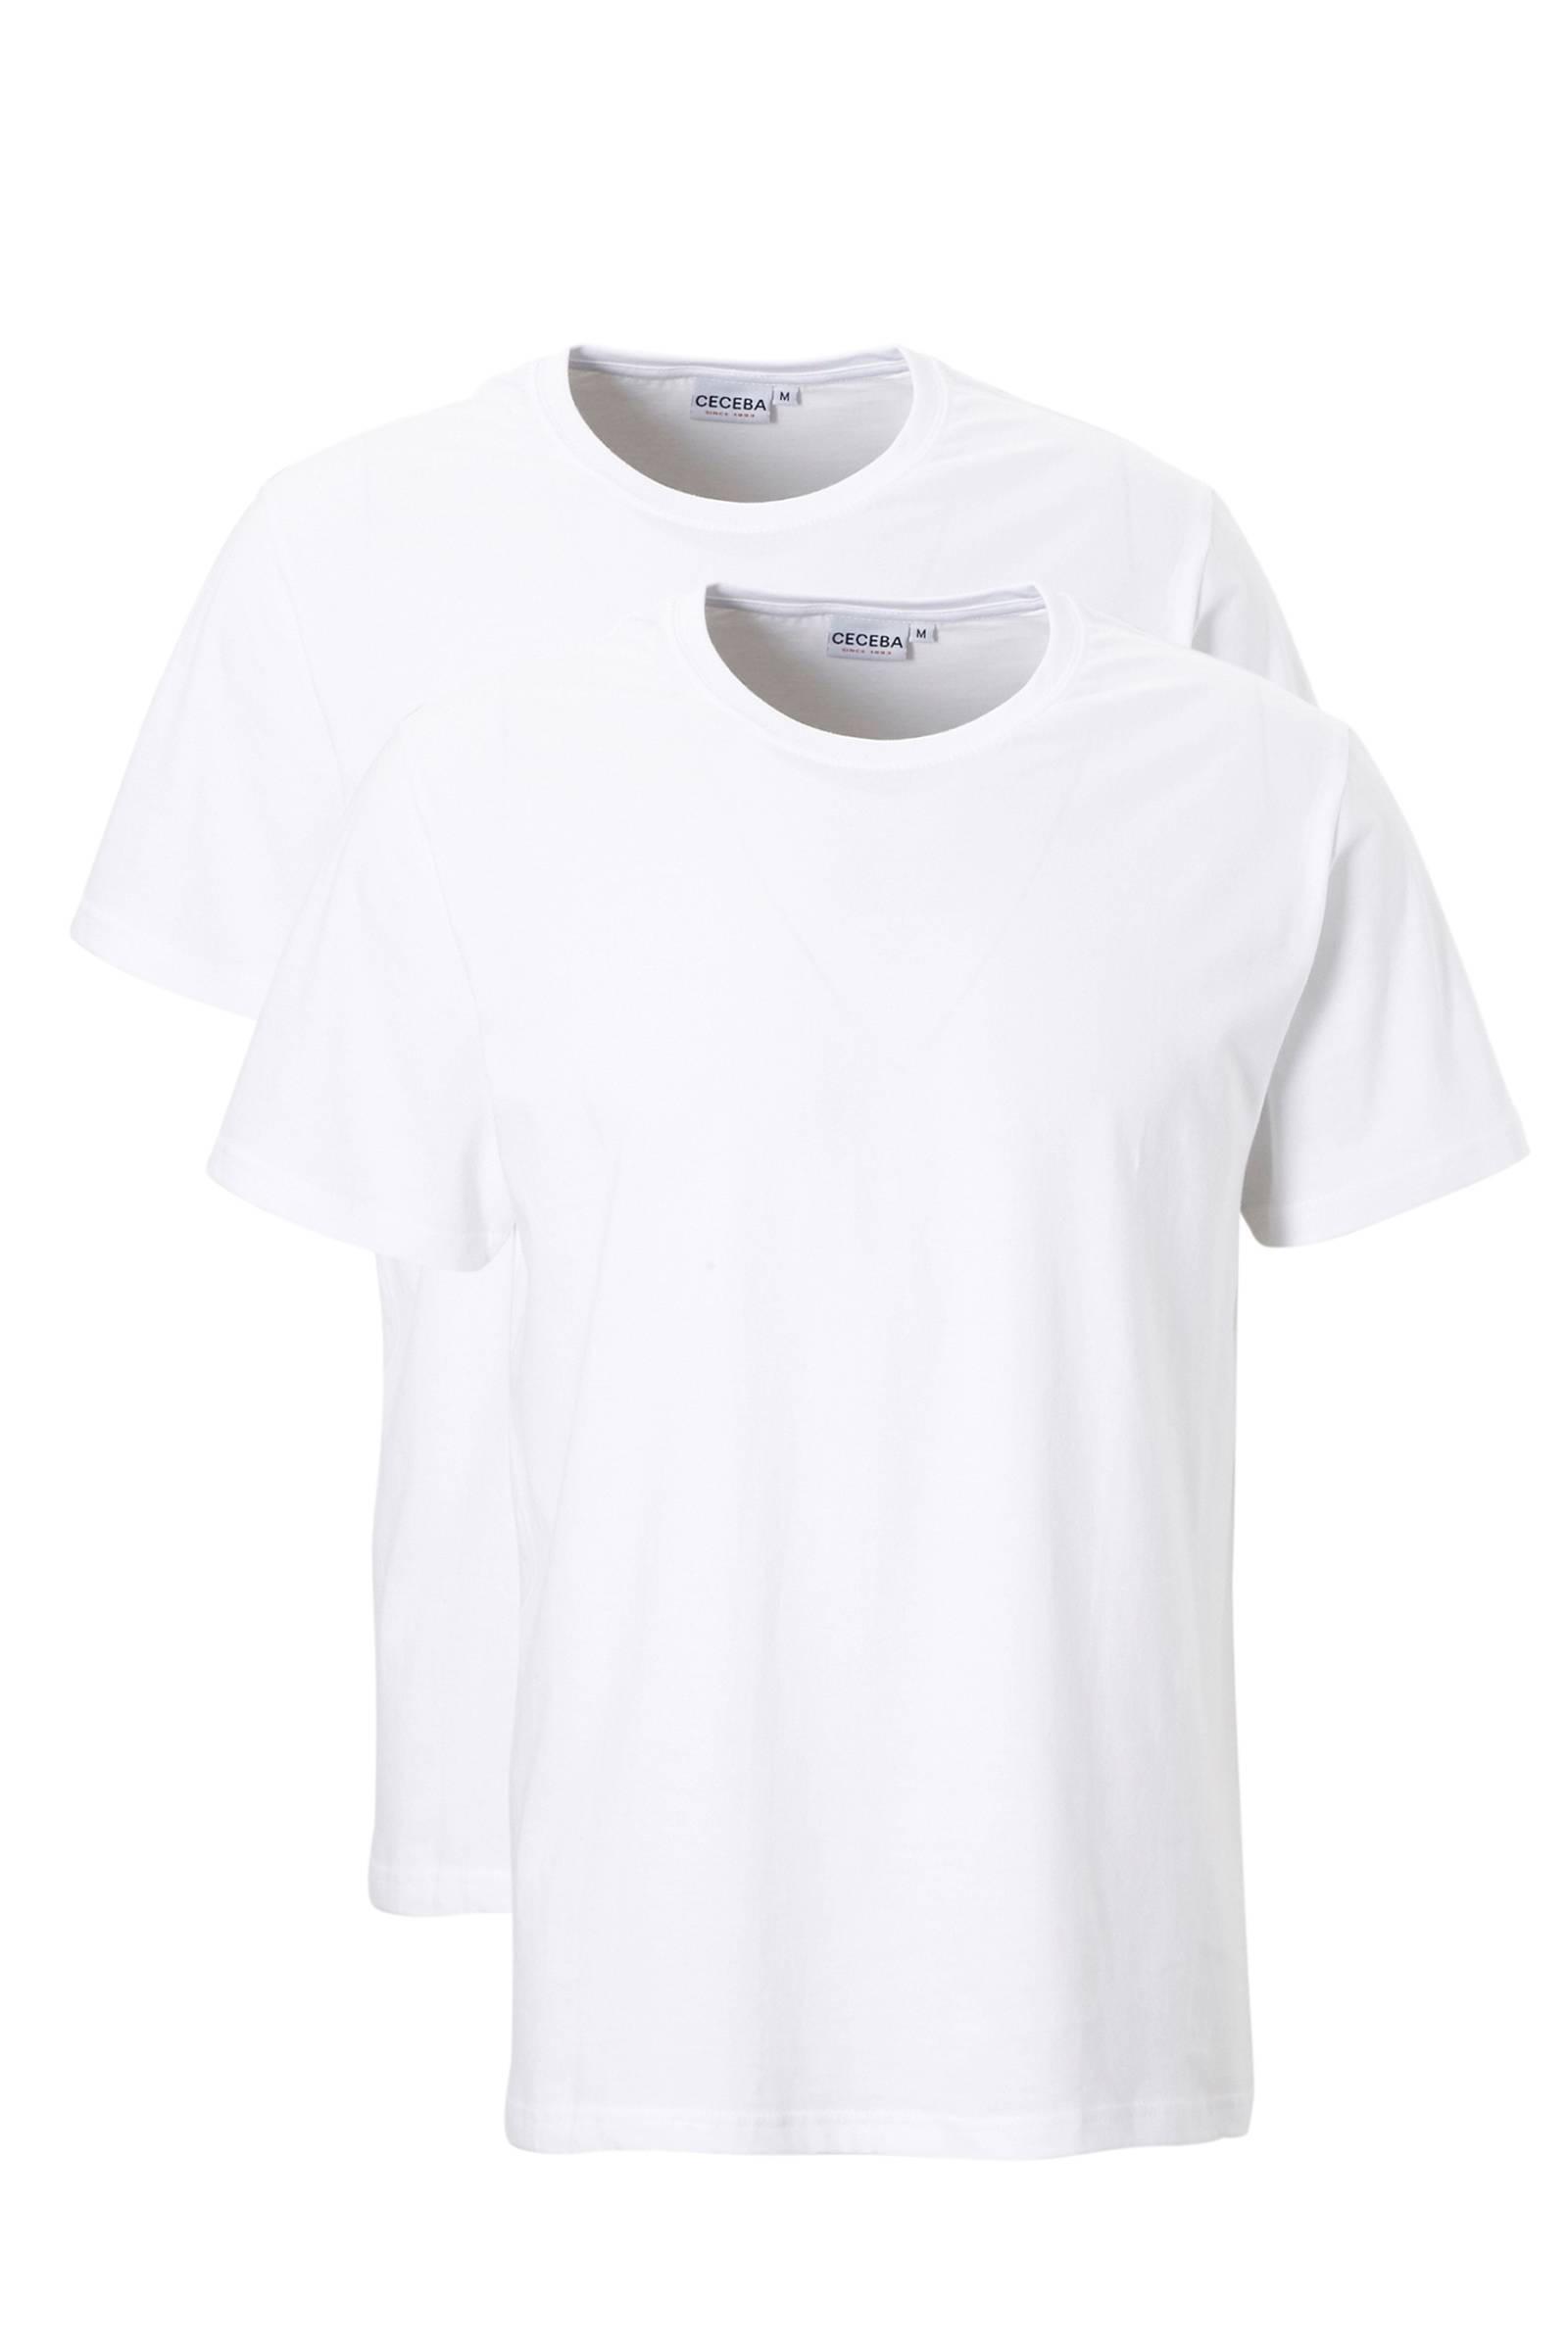 Ceceba basic t-shirt  +size (set van 2) (heren)